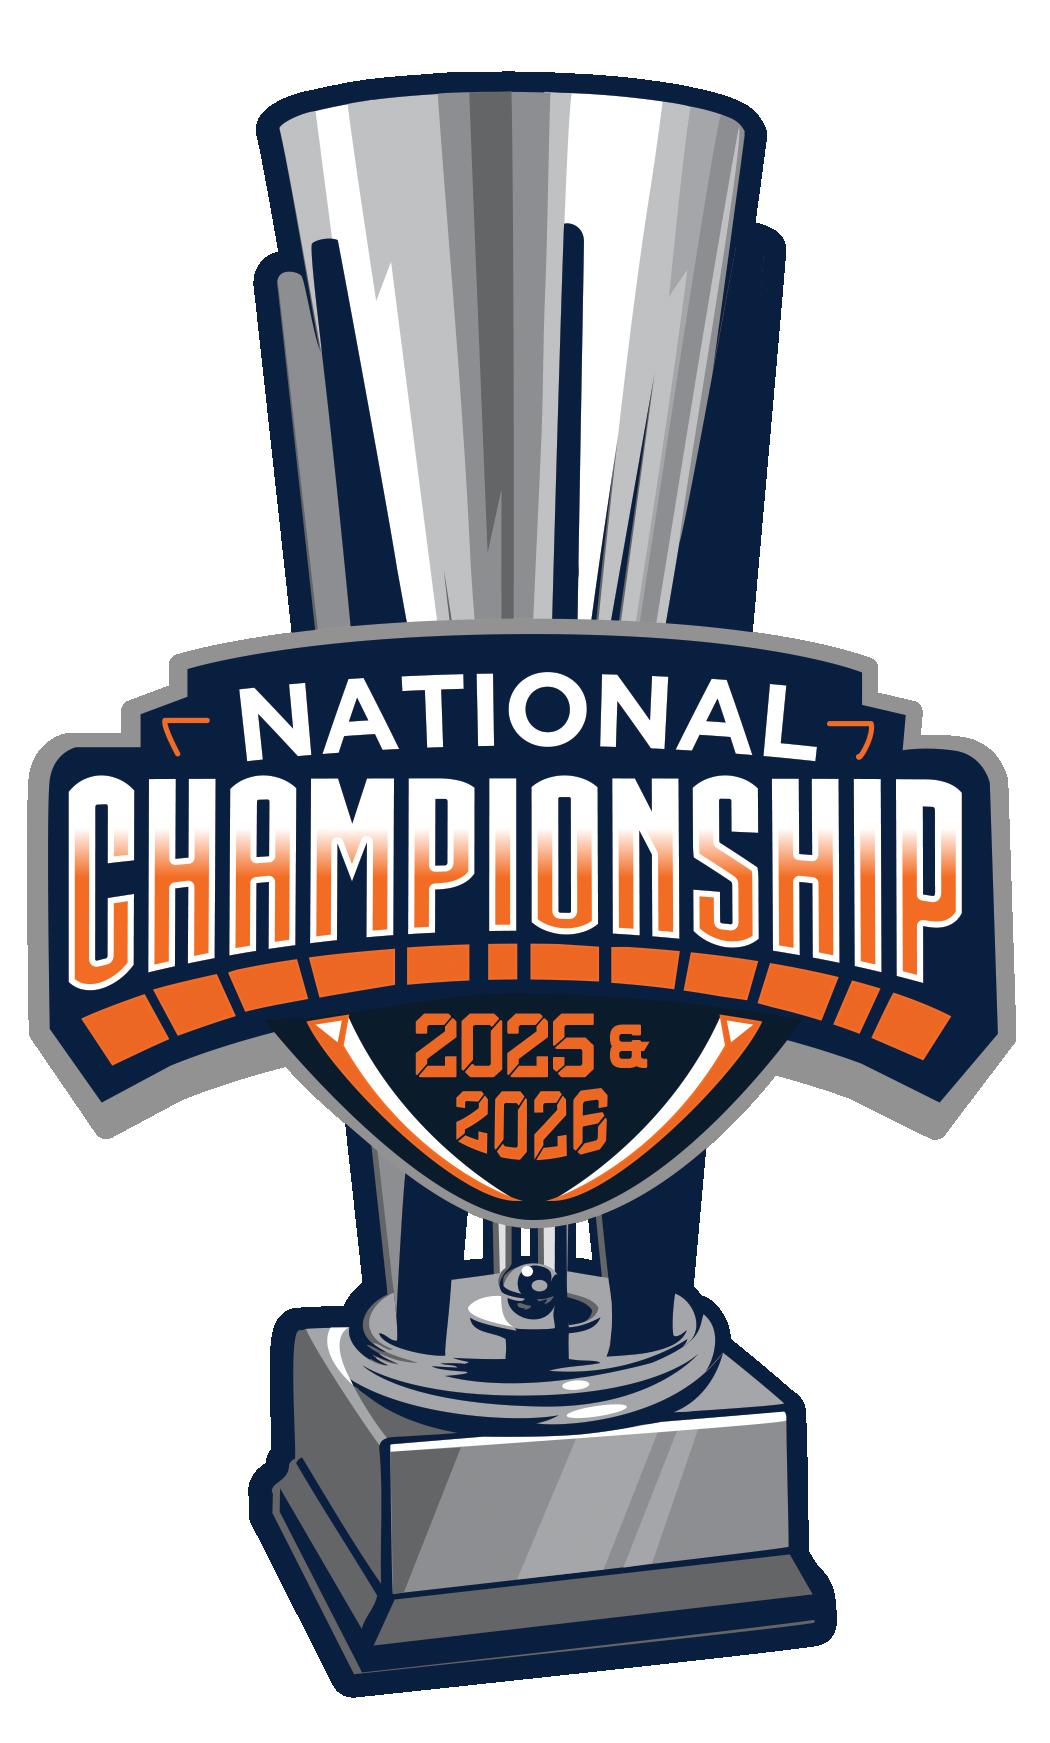 2026 National Championship